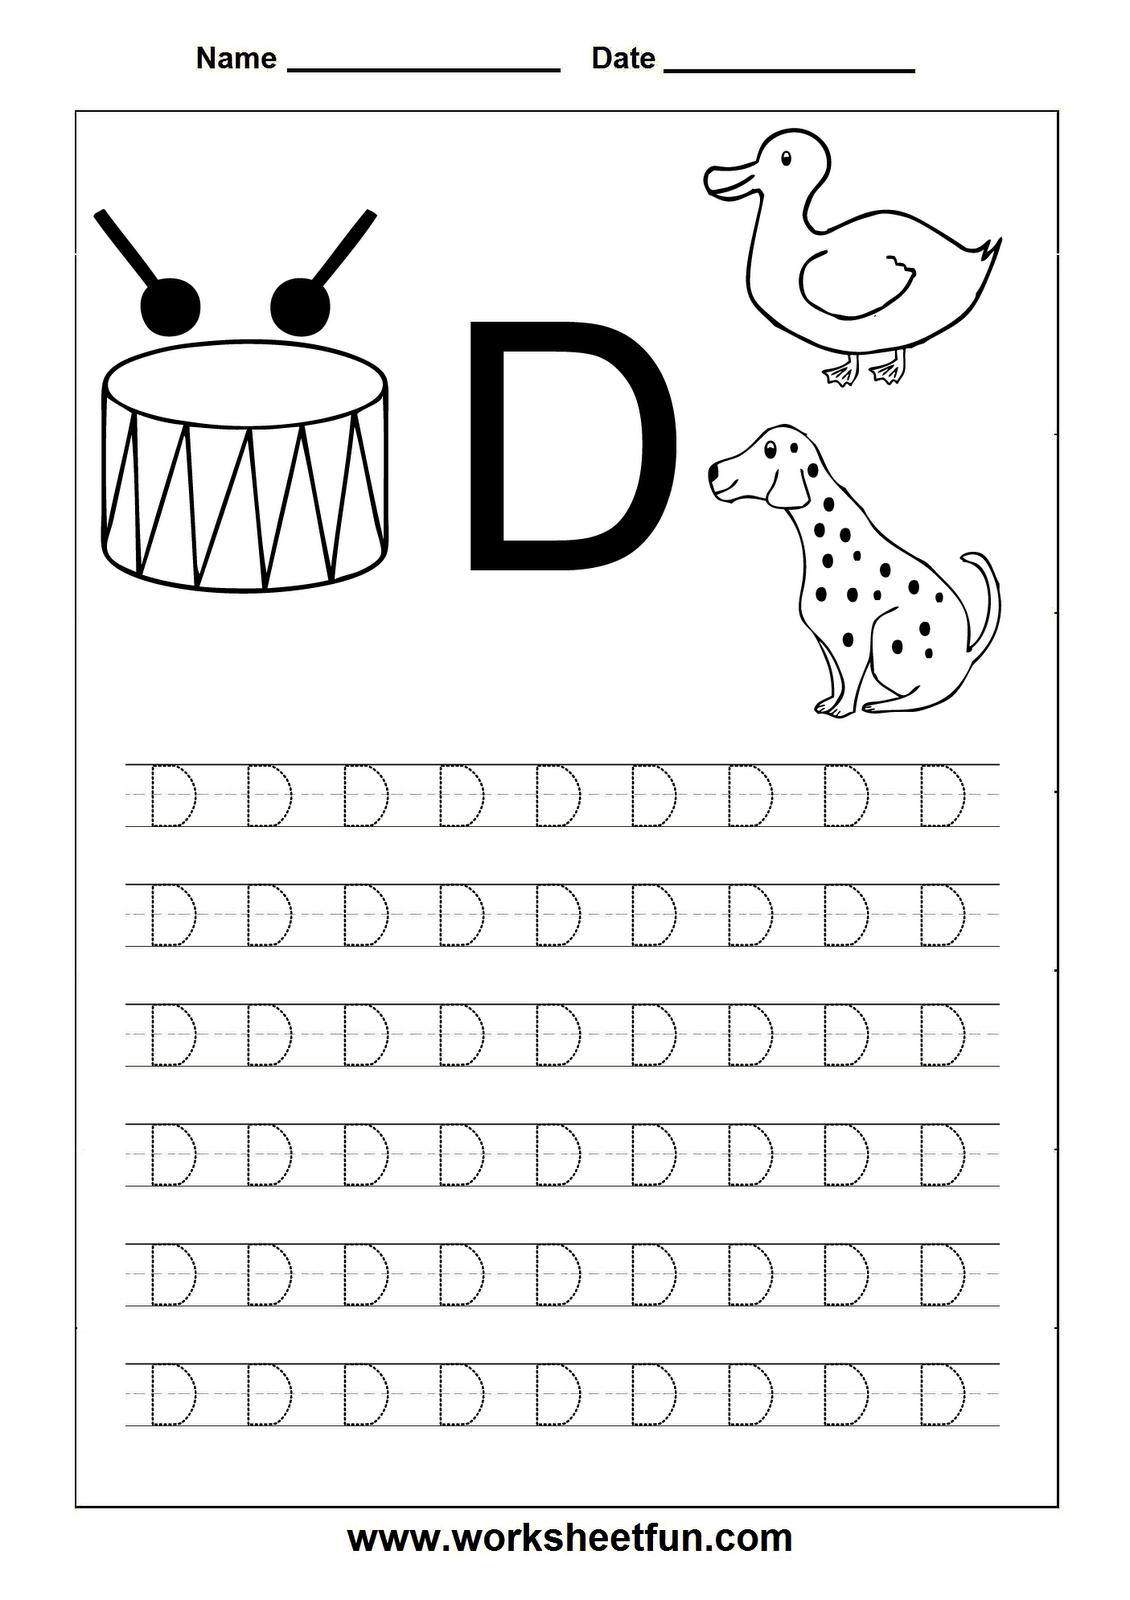 Letter D Worksheets Hd Wallpapers Download Free Letter D